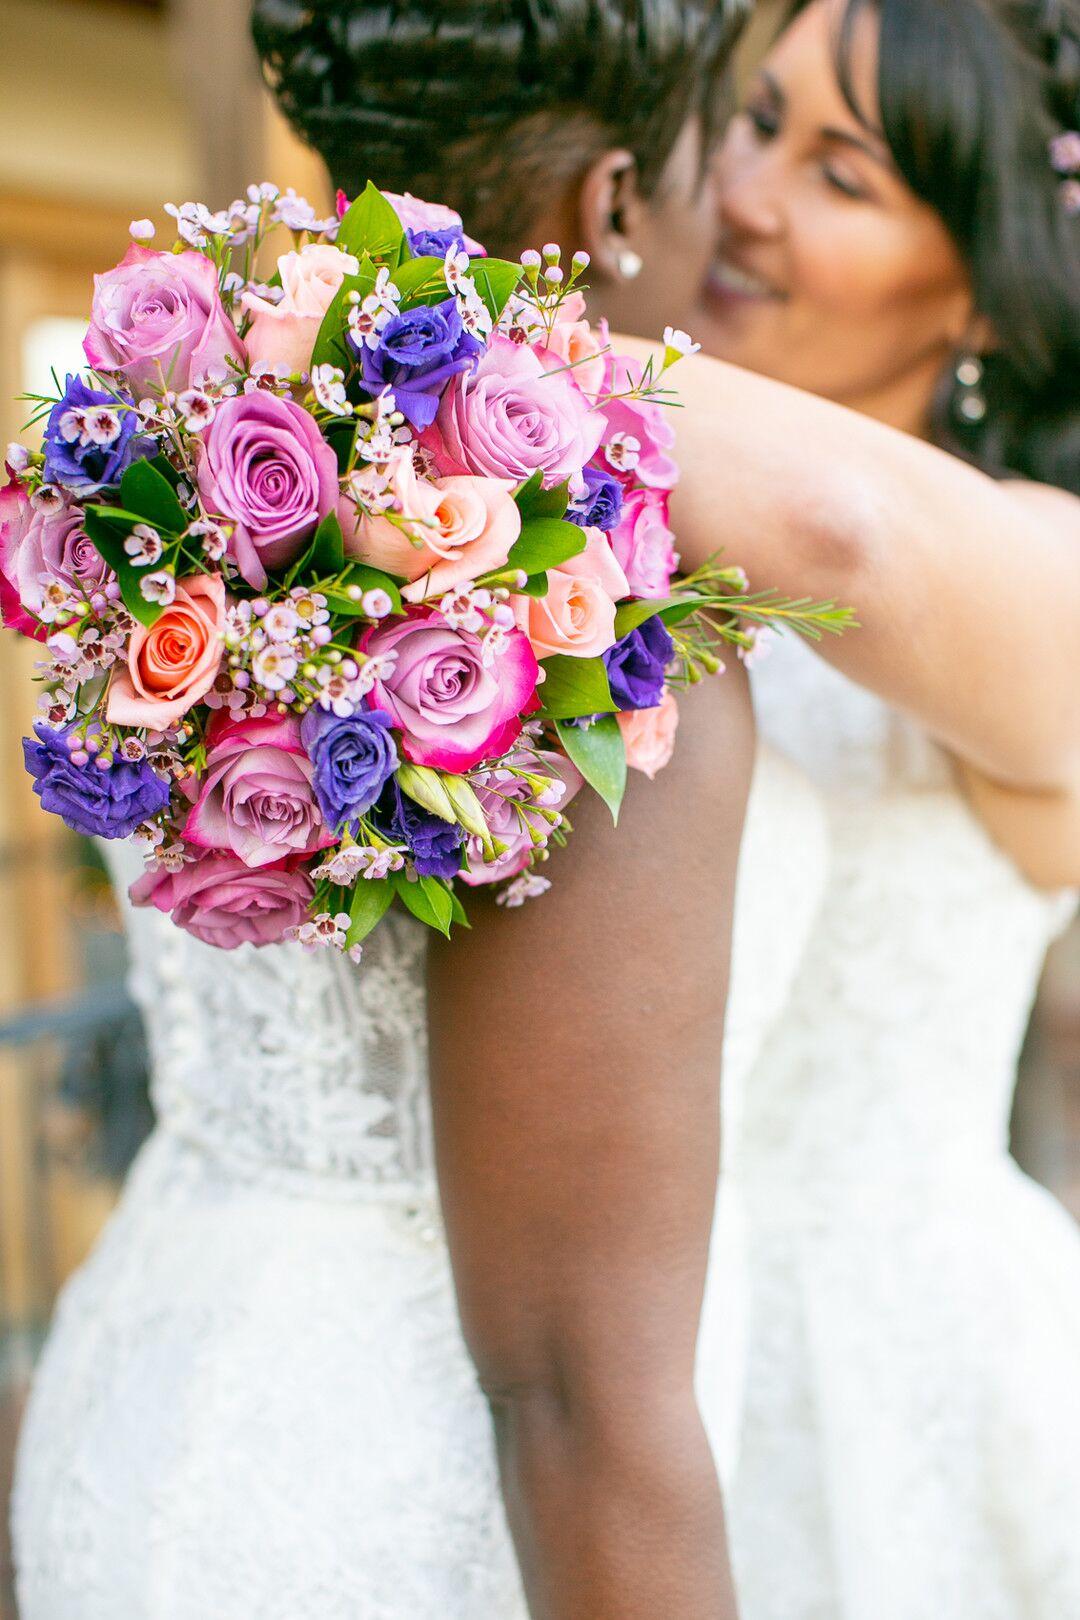 www.santabarbarawedding.com | Venue: The Casitas of Arroyo Grande | Photographer: Renoda Campbell Photography | Second Shooter: John Patrick Images |  Brides and Bouquet